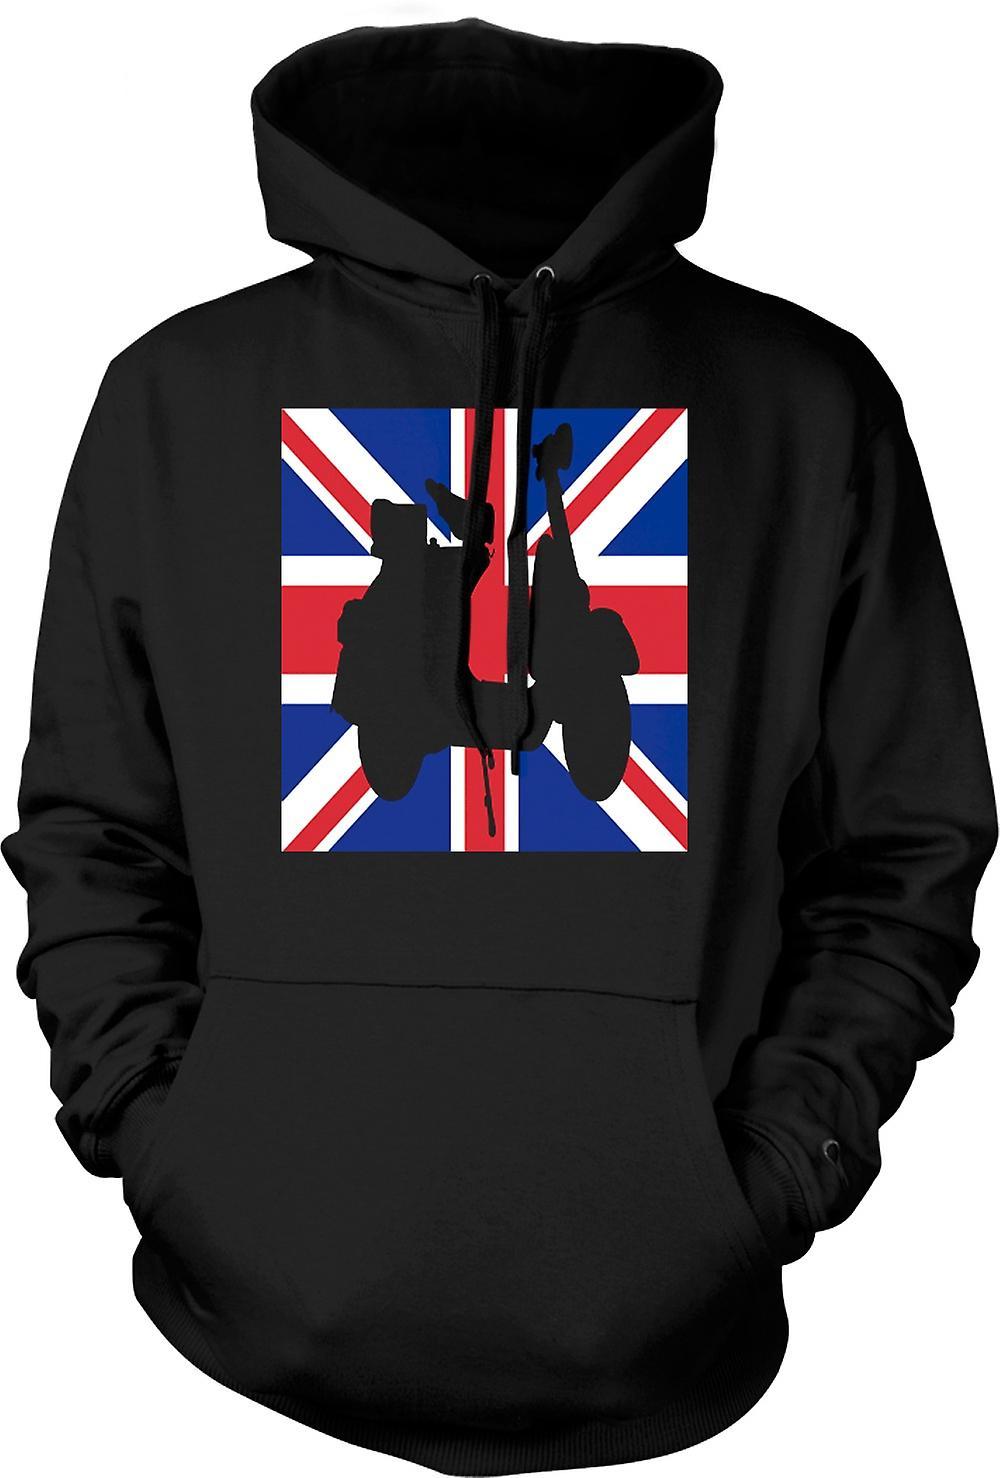 Mens Hoodie - Scooter Vespa - Union Jack